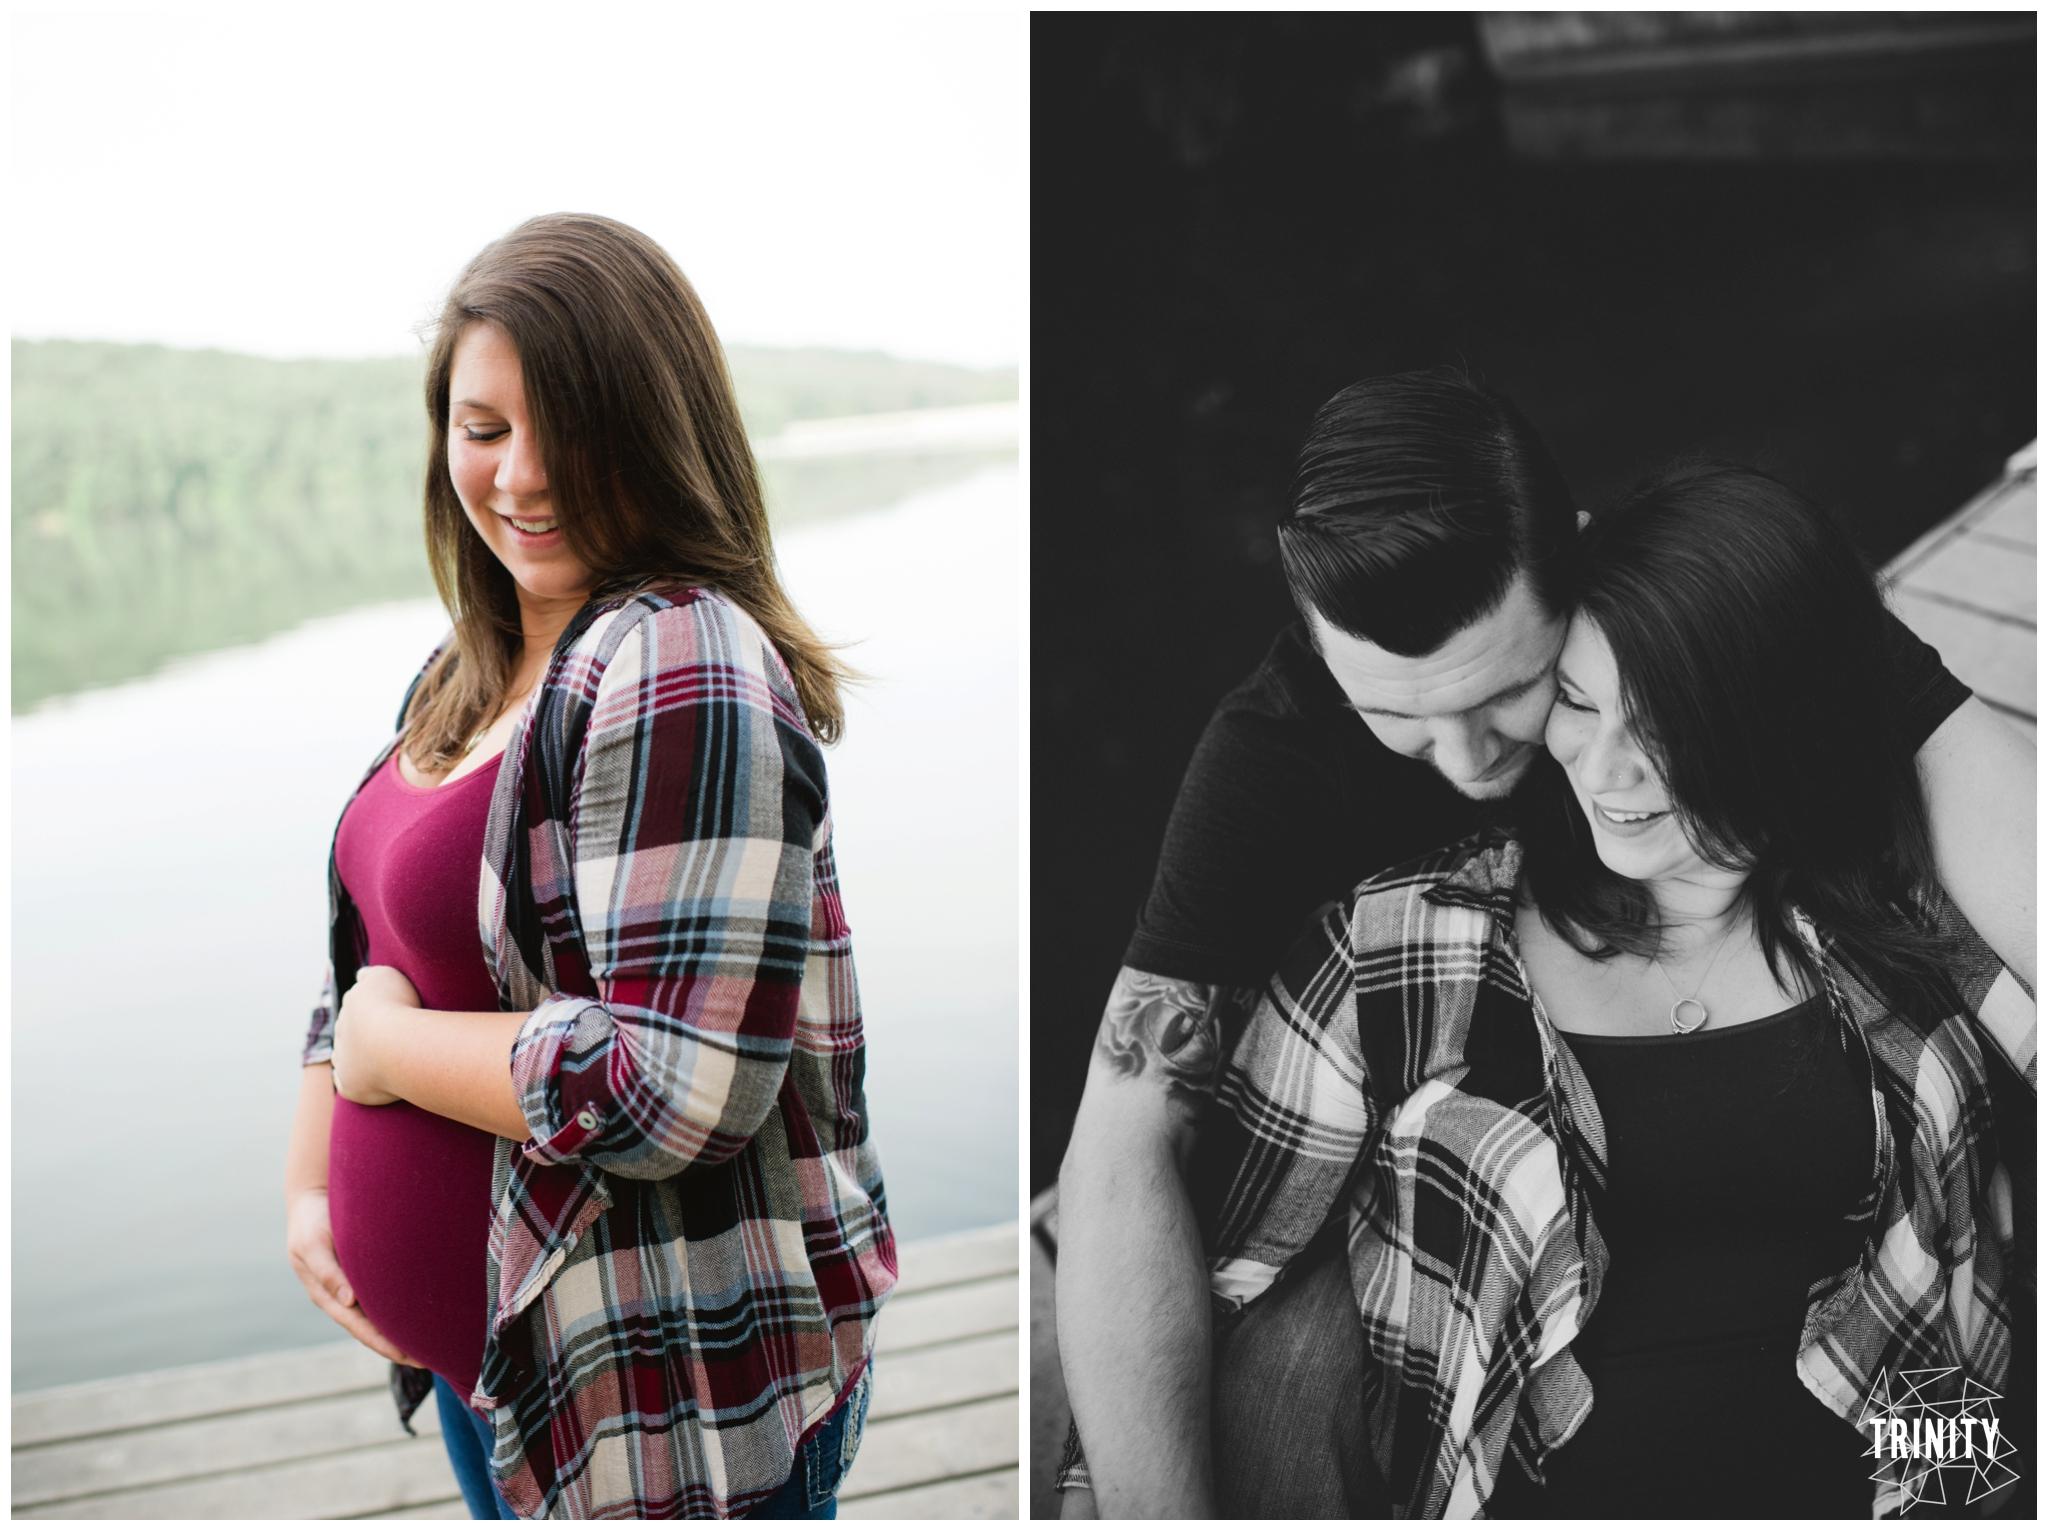 SCHMIDT-maternity-PROOFS-4453_WEBstomp.jpg